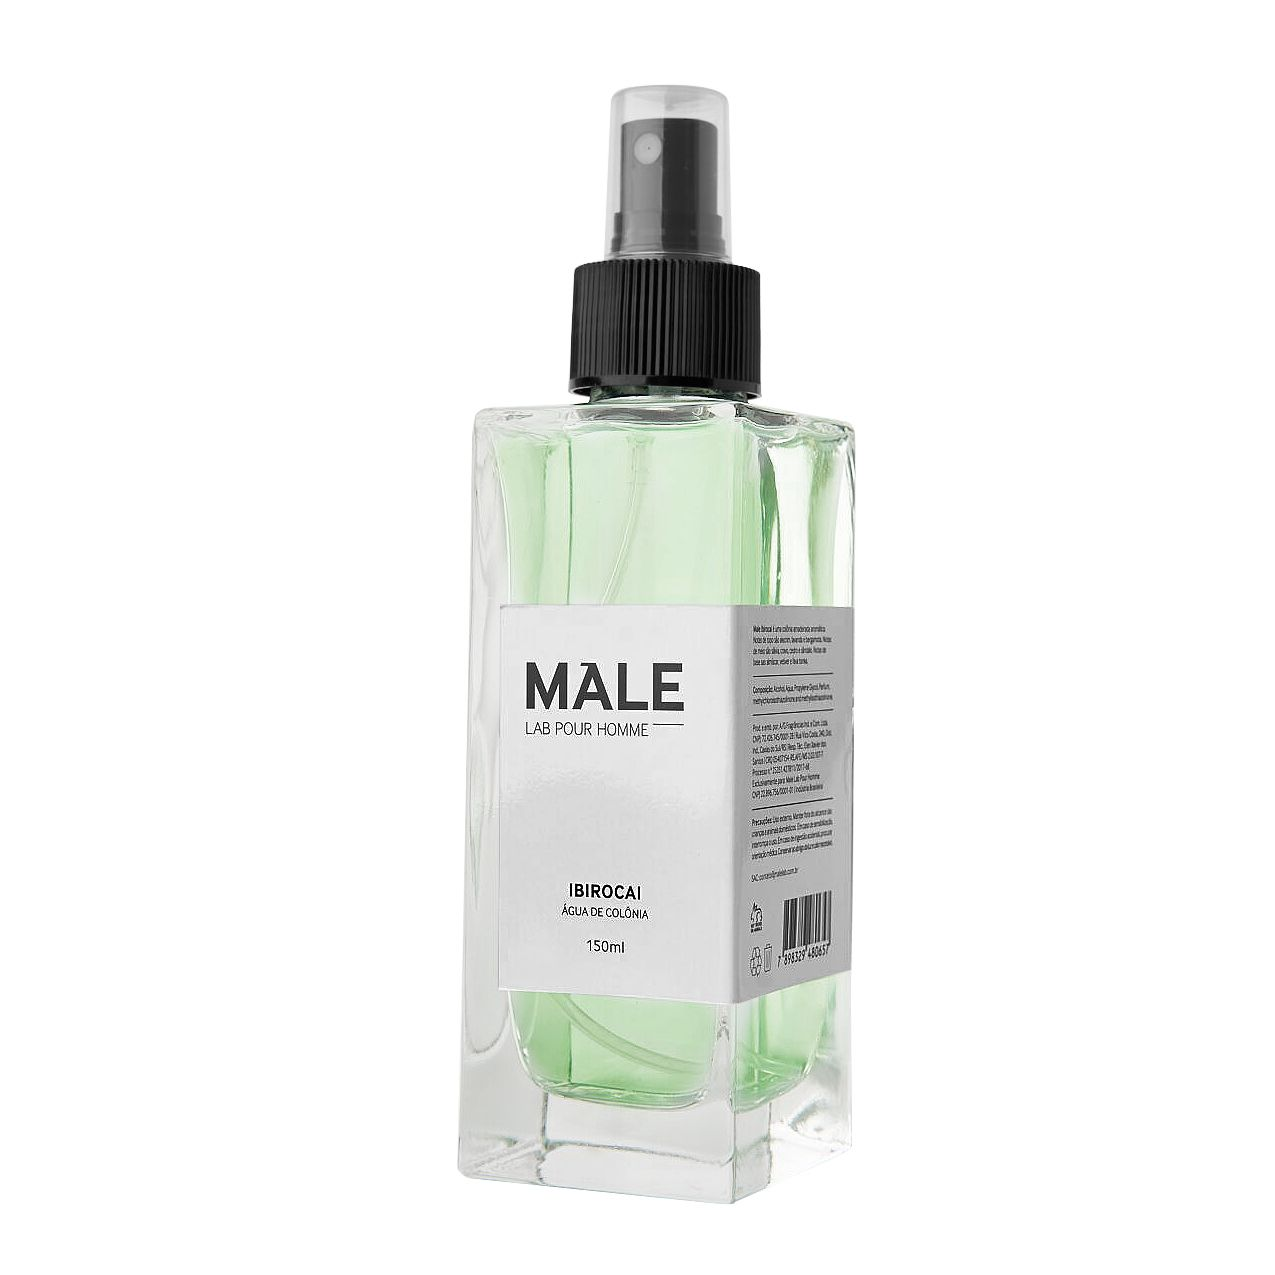 Perfume Ibirocai | Male Lab Pour Homme